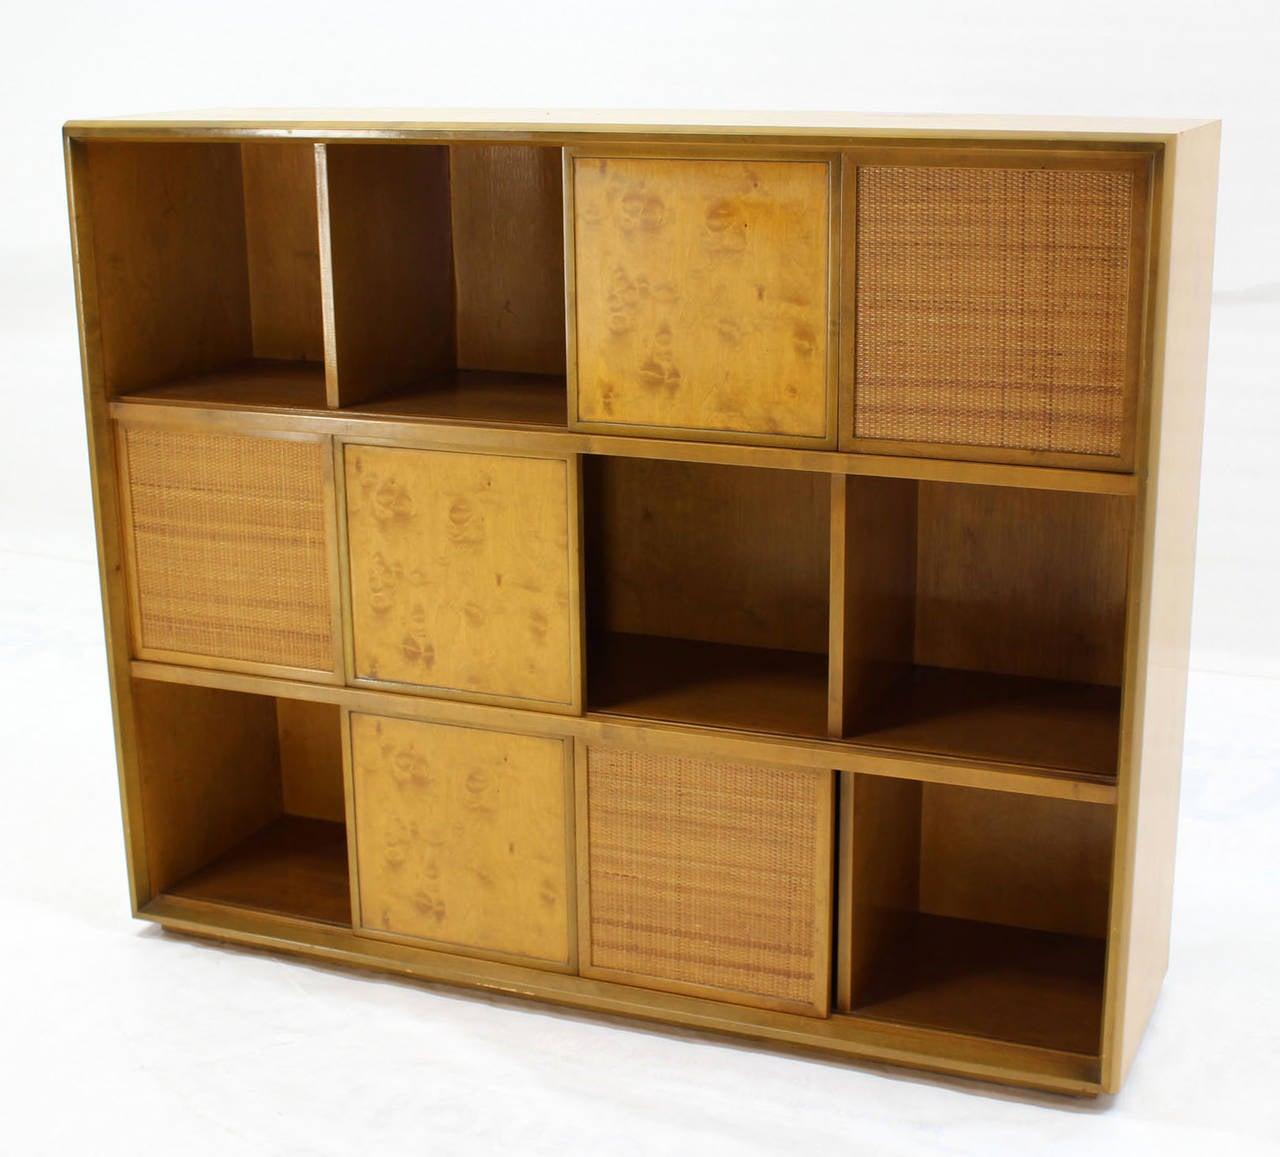 swedish mid century modern bookcase by edmund spence at 1stdibs. Black Bedroom Furniture Sets. Home Design Ideas